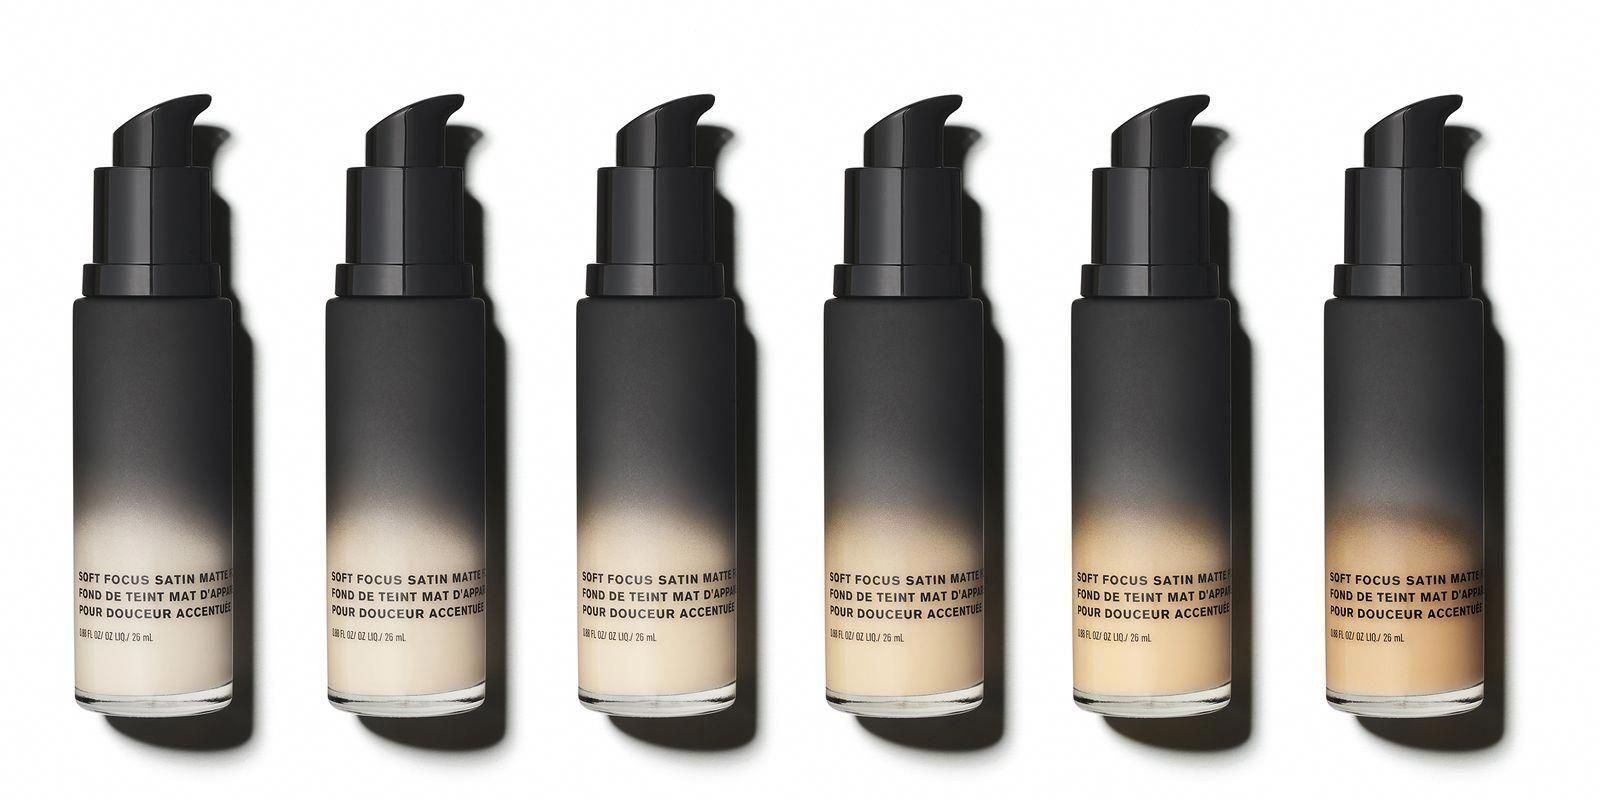 Best For Mattifying Oily Skin